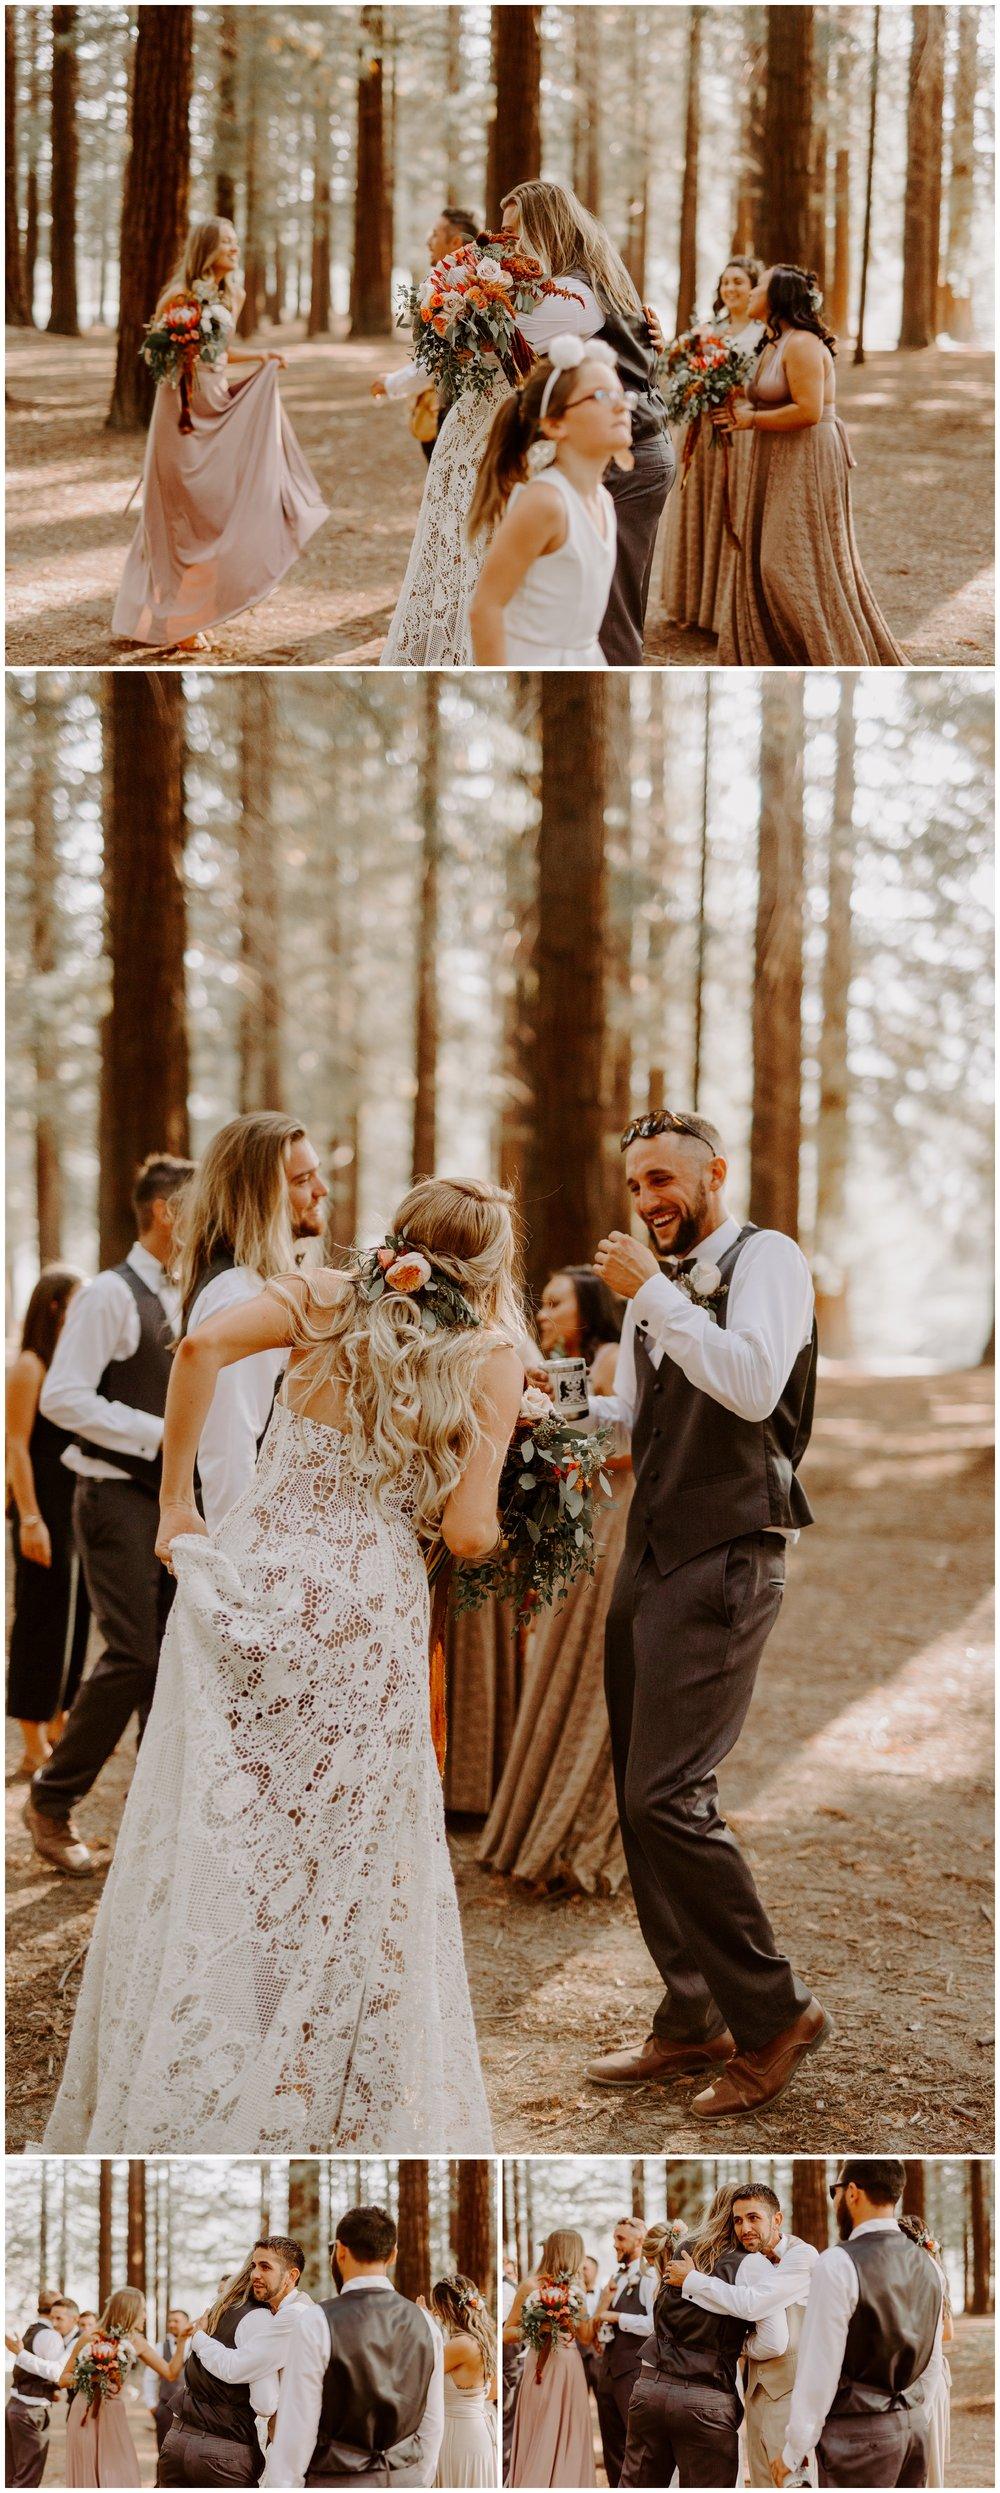 Redwood Festival Wedding Humbolt California - Jessica Heron Images_0042.jpg